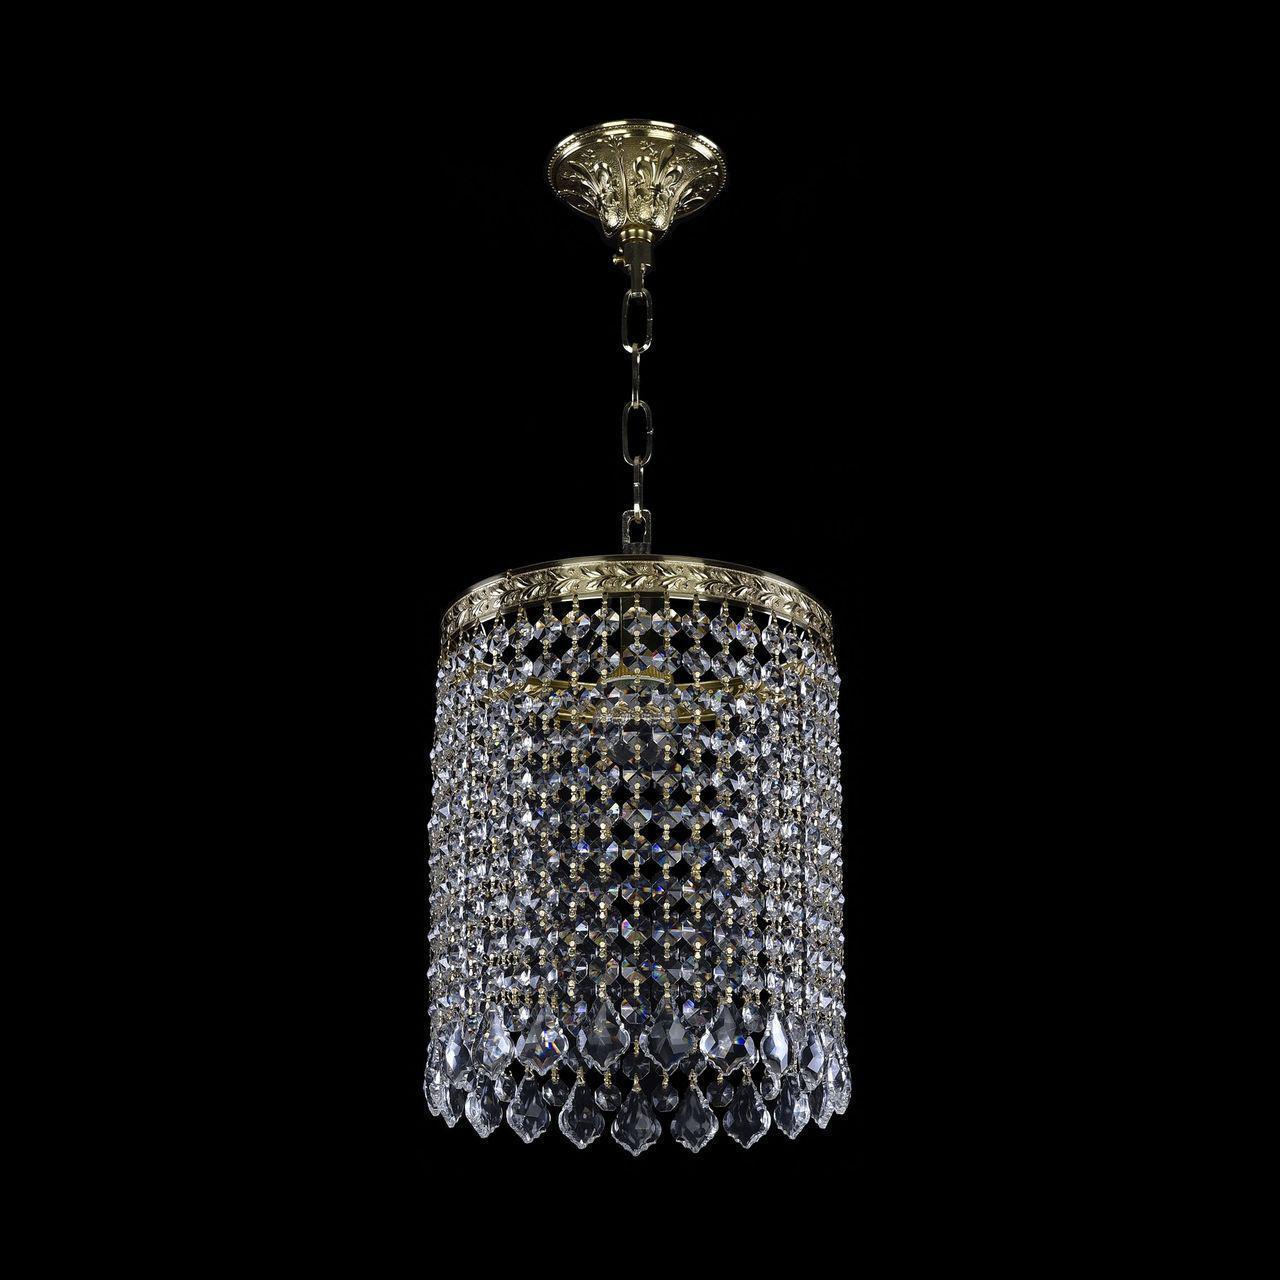 Подвесной светильник Bohemia Ivele 19201/20IV G Leafs